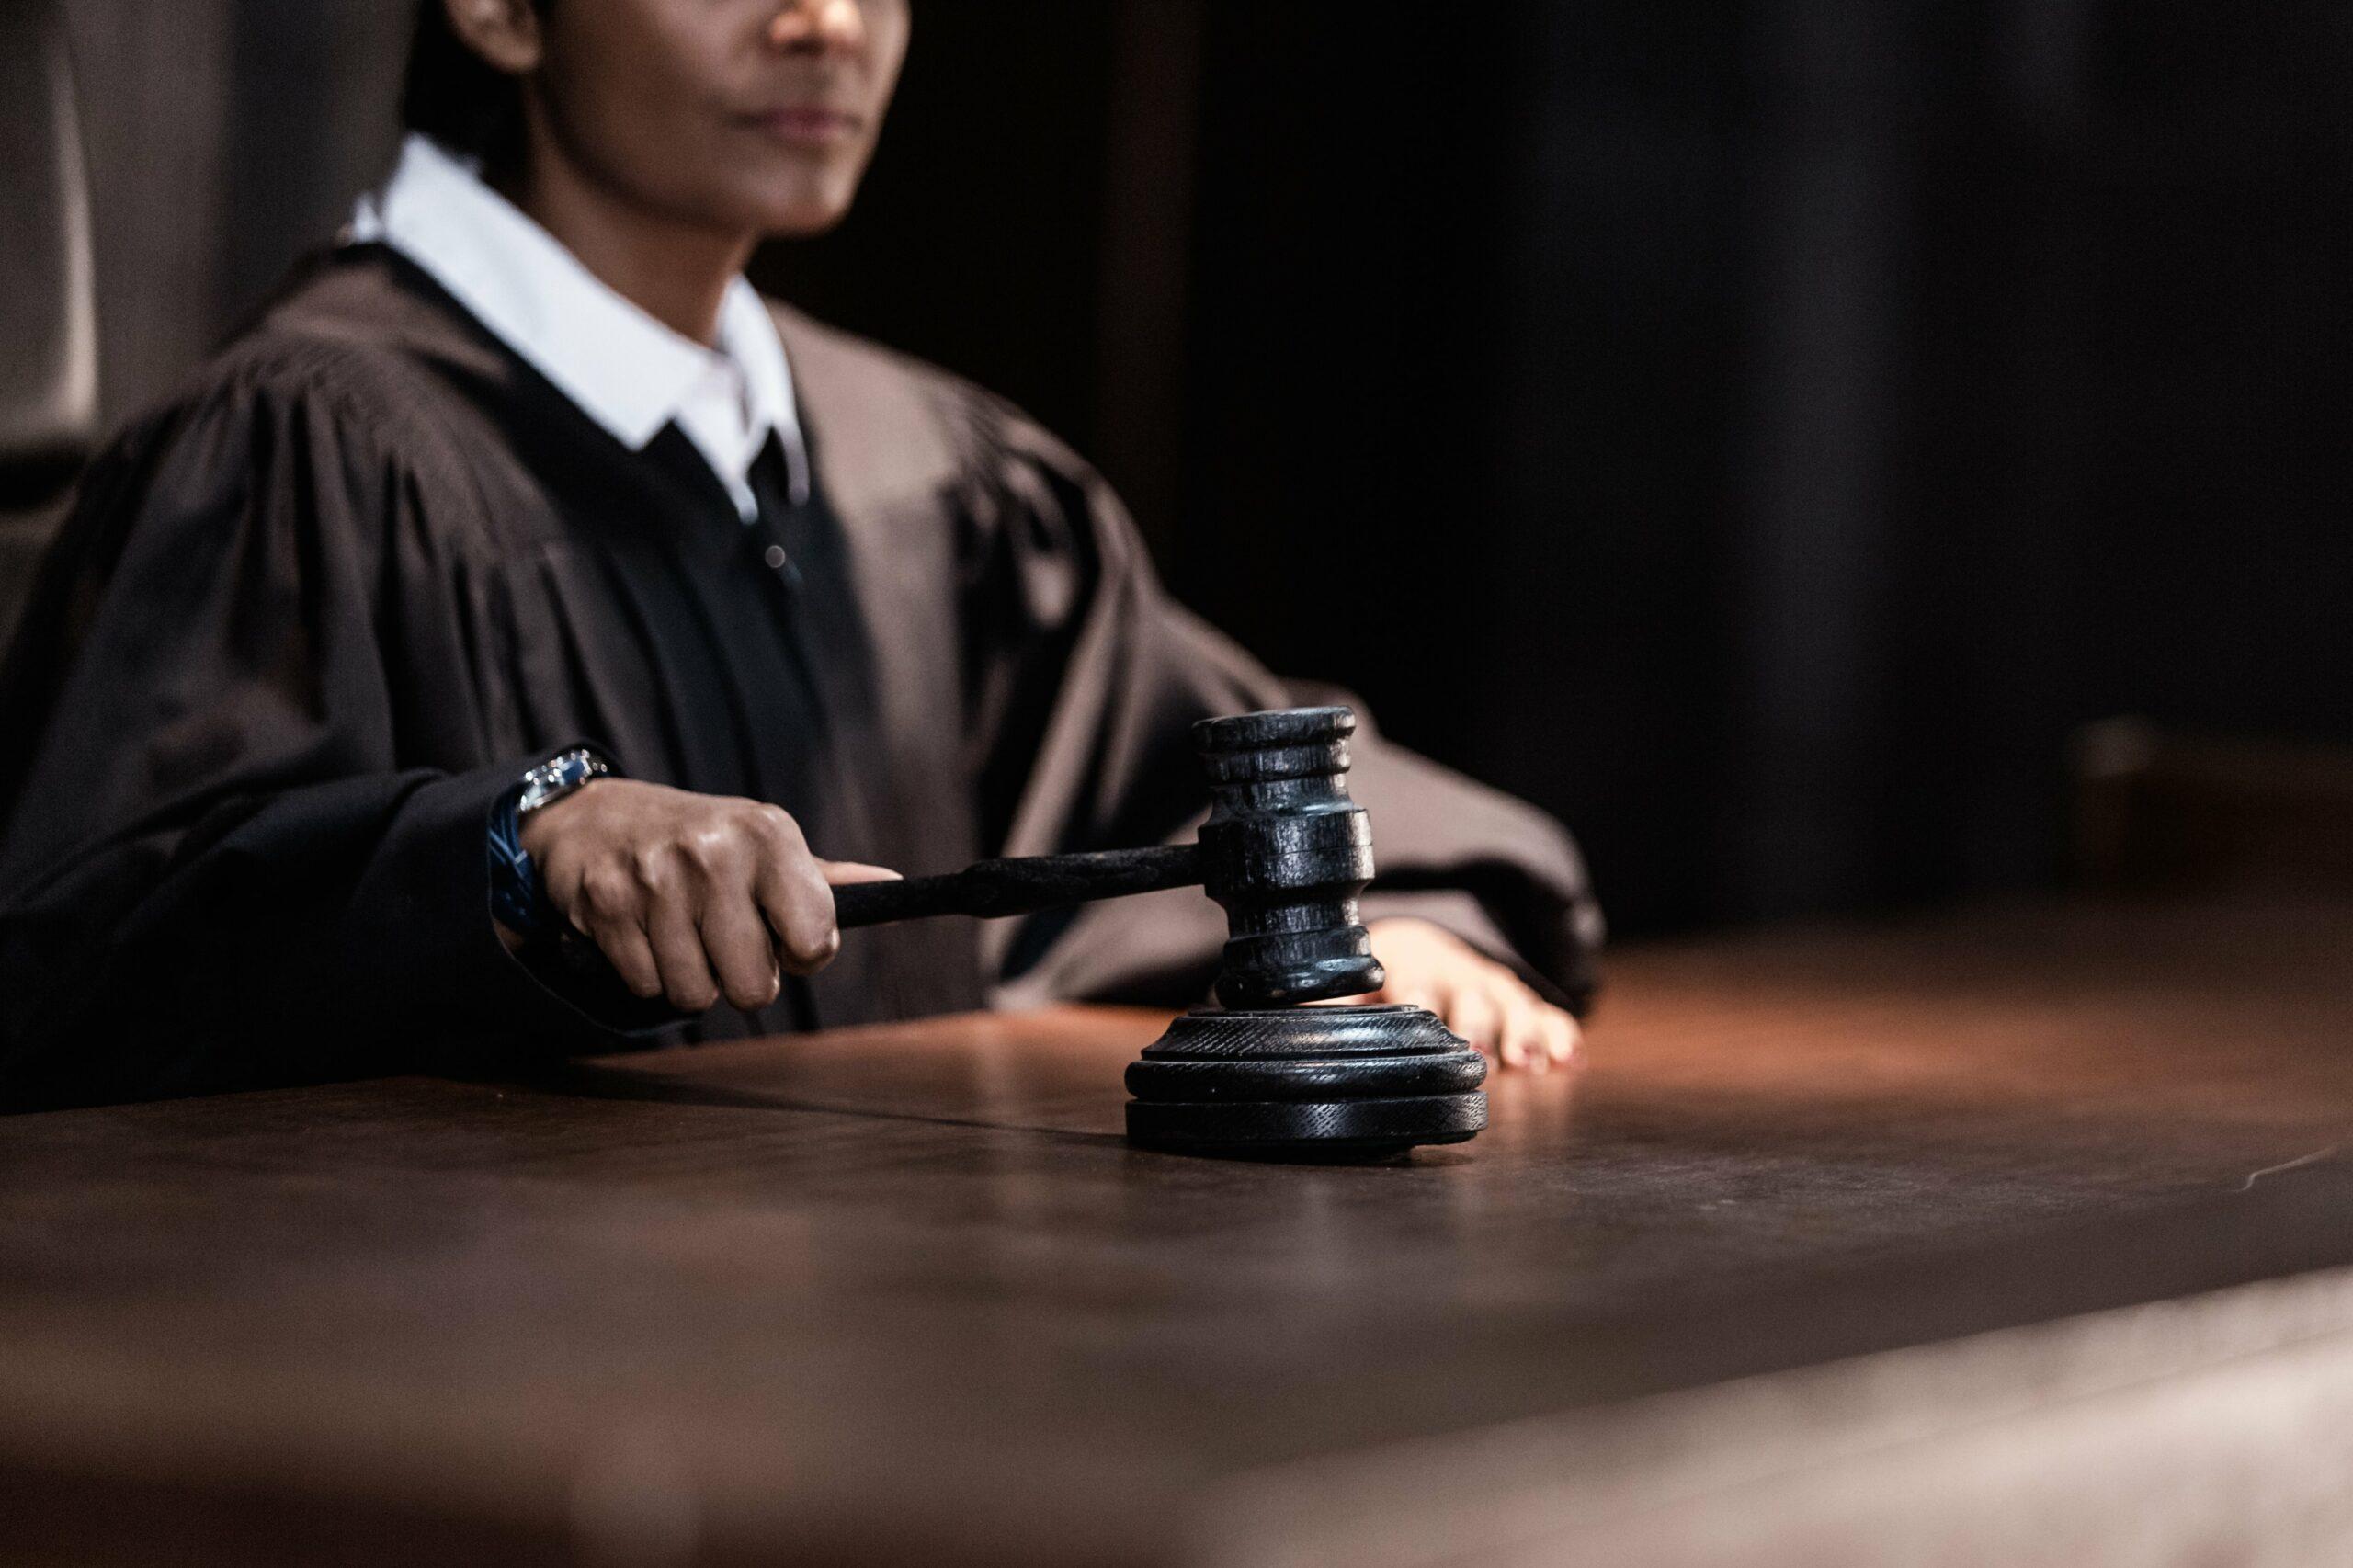 judge-slamming-down-a-gavel